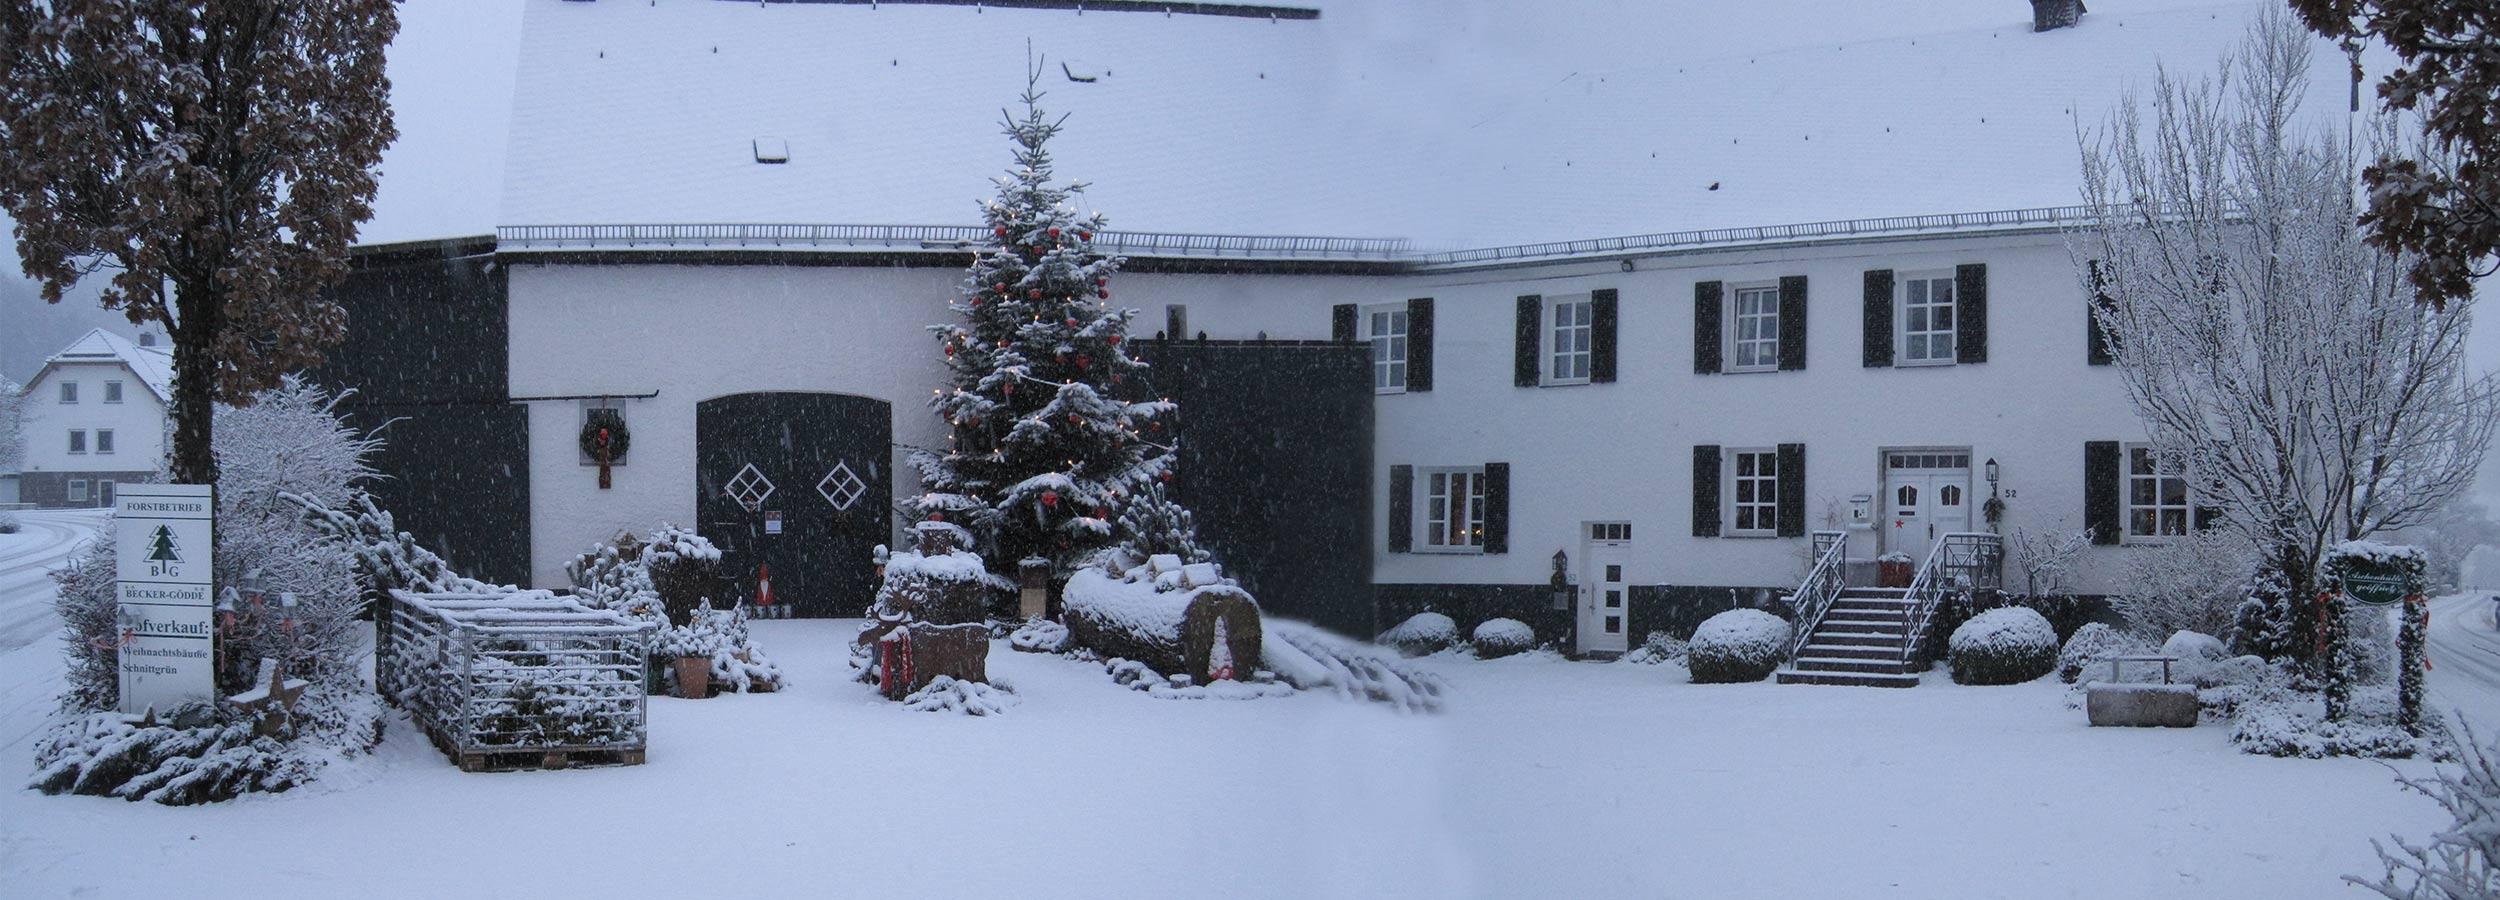 winter_titelbild_becke_goedde